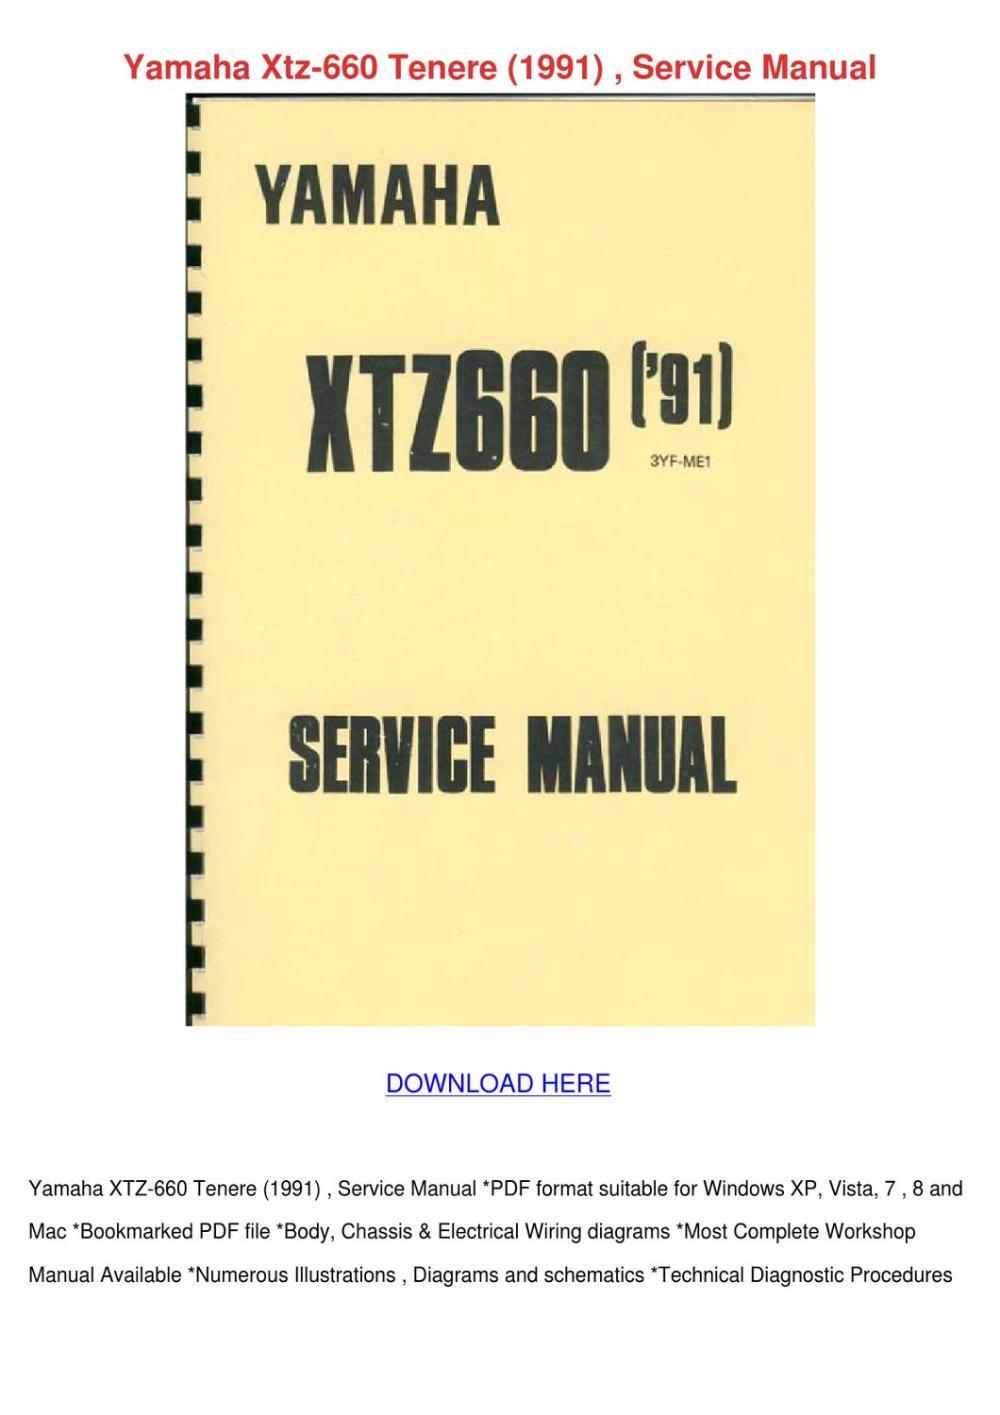 medium resolution of yamaha xtz 660 tenere 1991 service manual